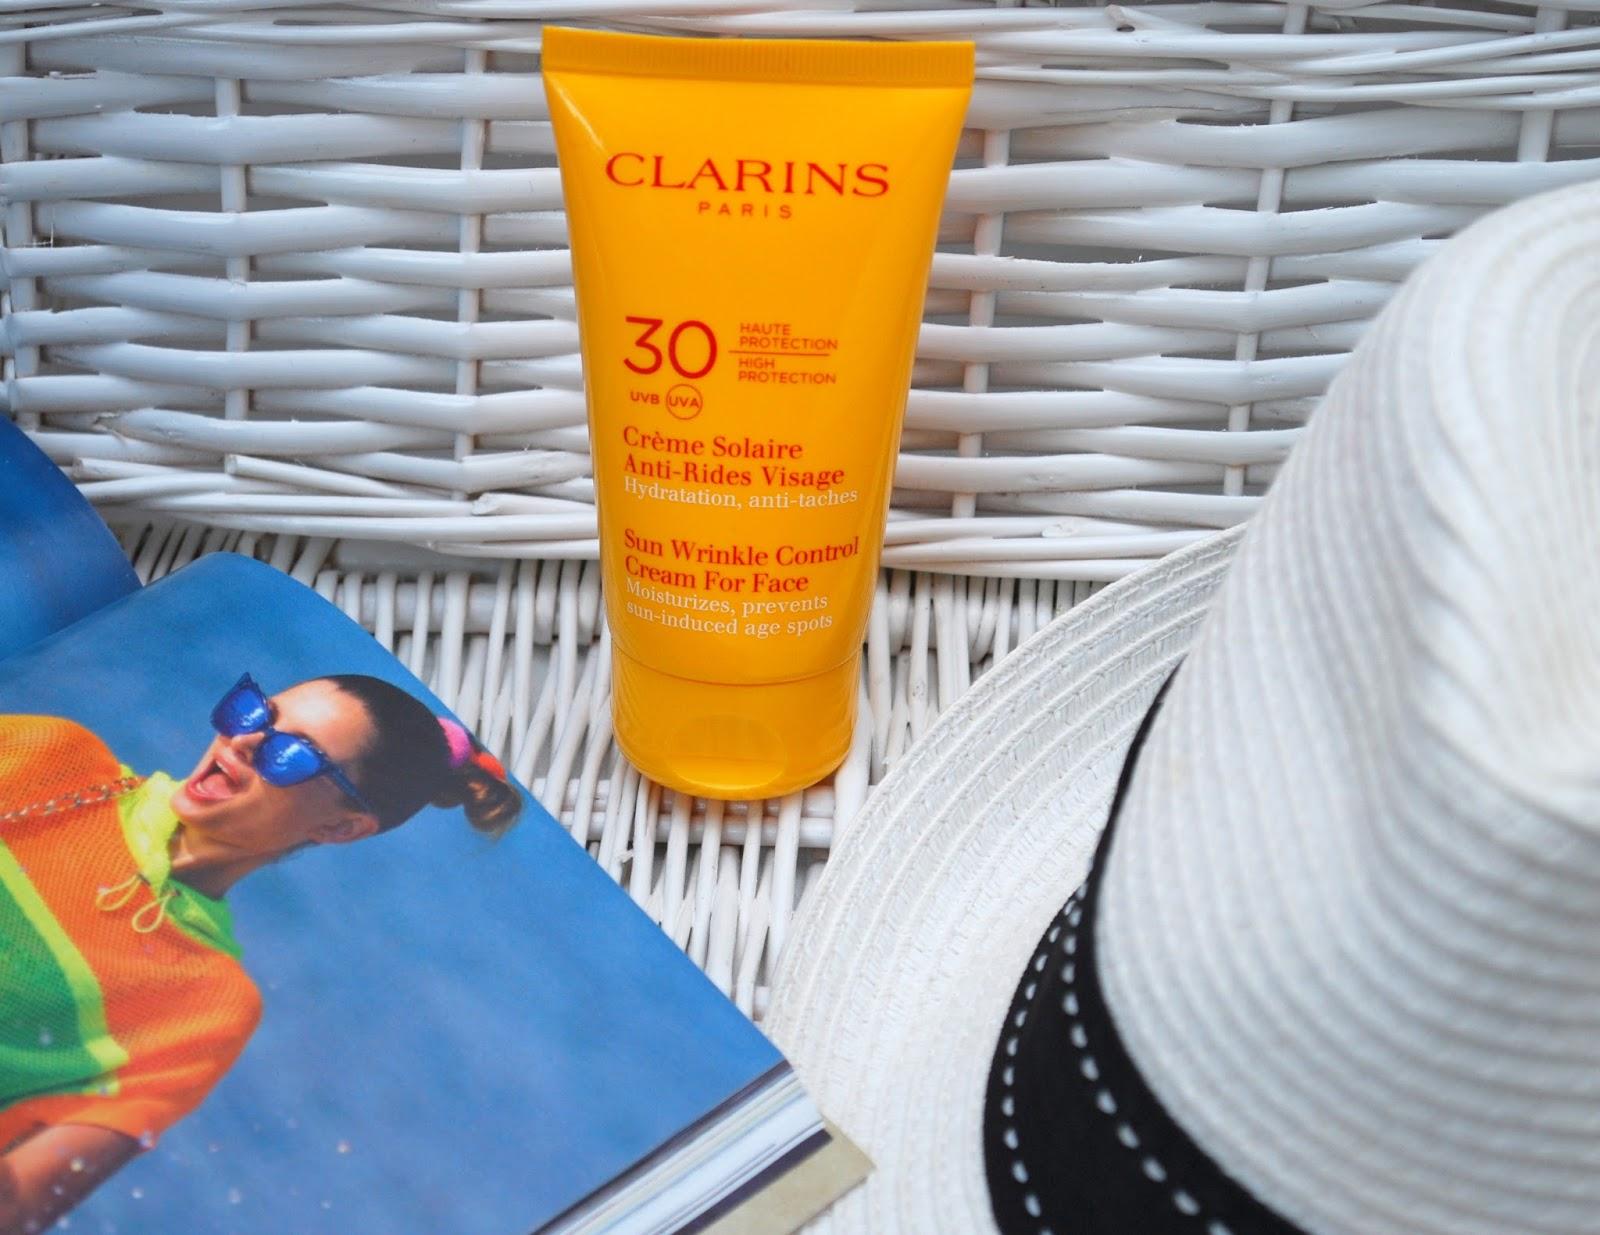 veraanda beauty clarins uvb 30 creme solaire anti. Black Bedroom Furniture Sets. Home Design Ideas